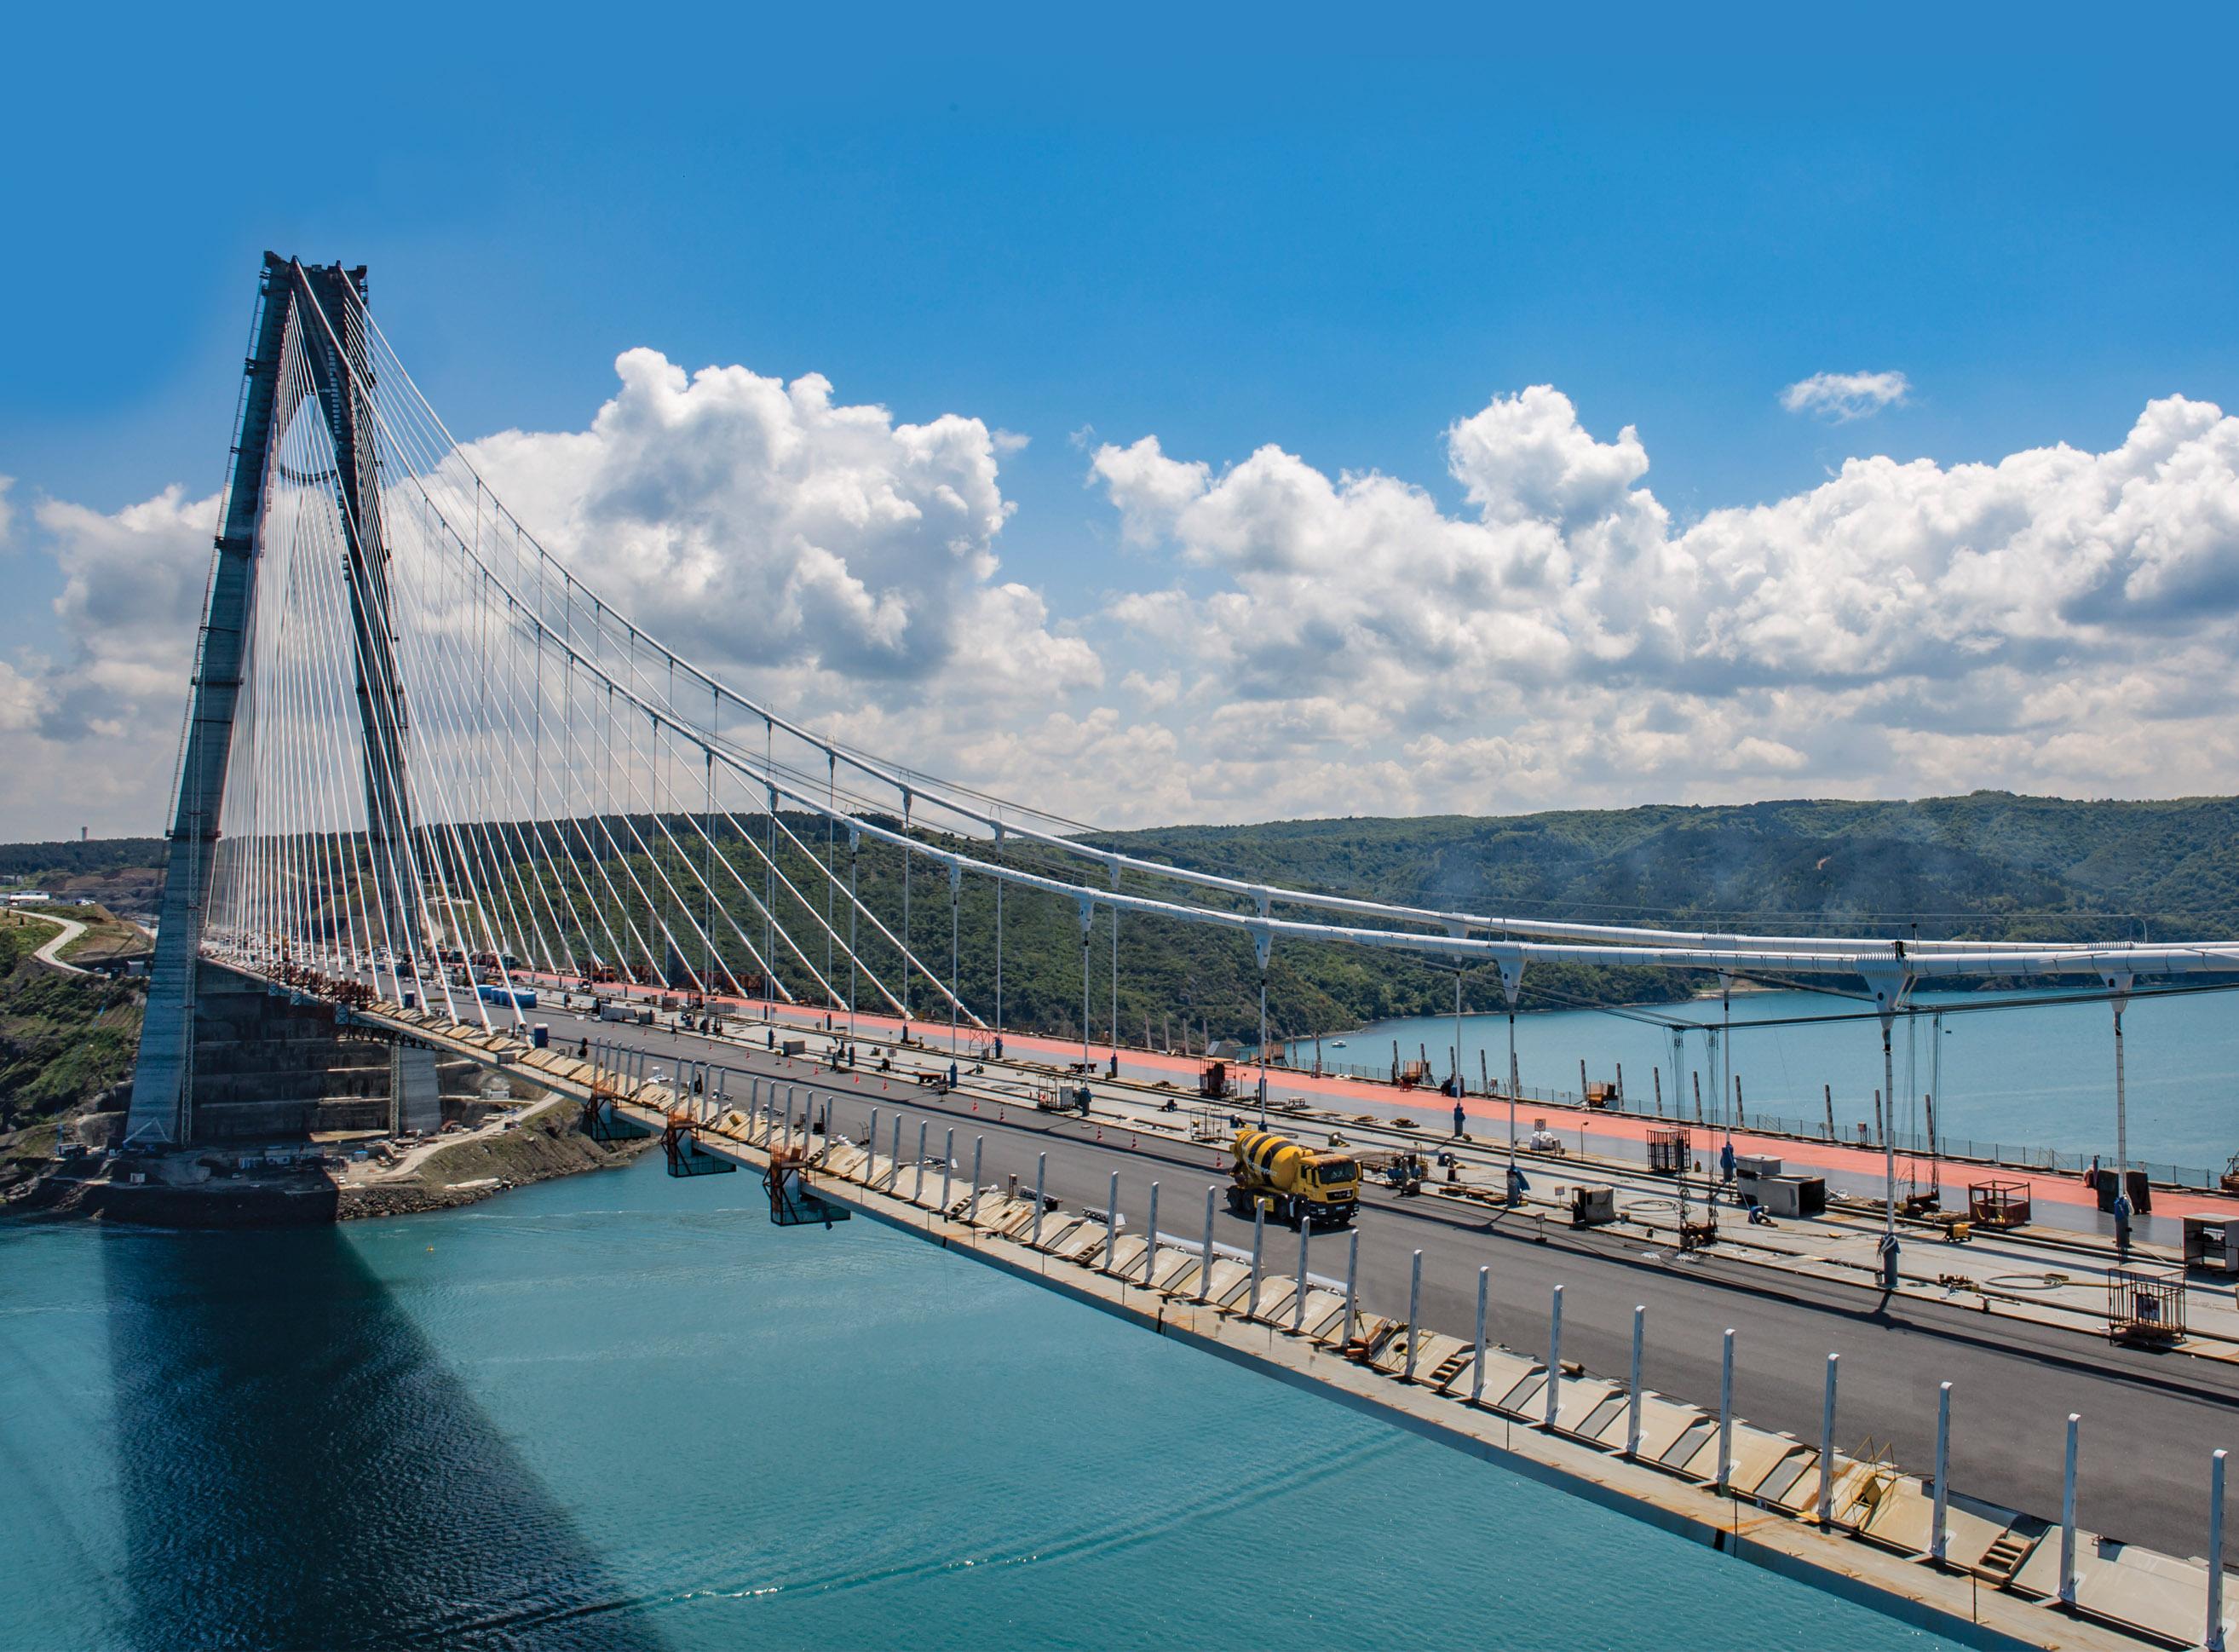 3rd Bosphorus Bridge, Turkey | HeidelbergCement Group